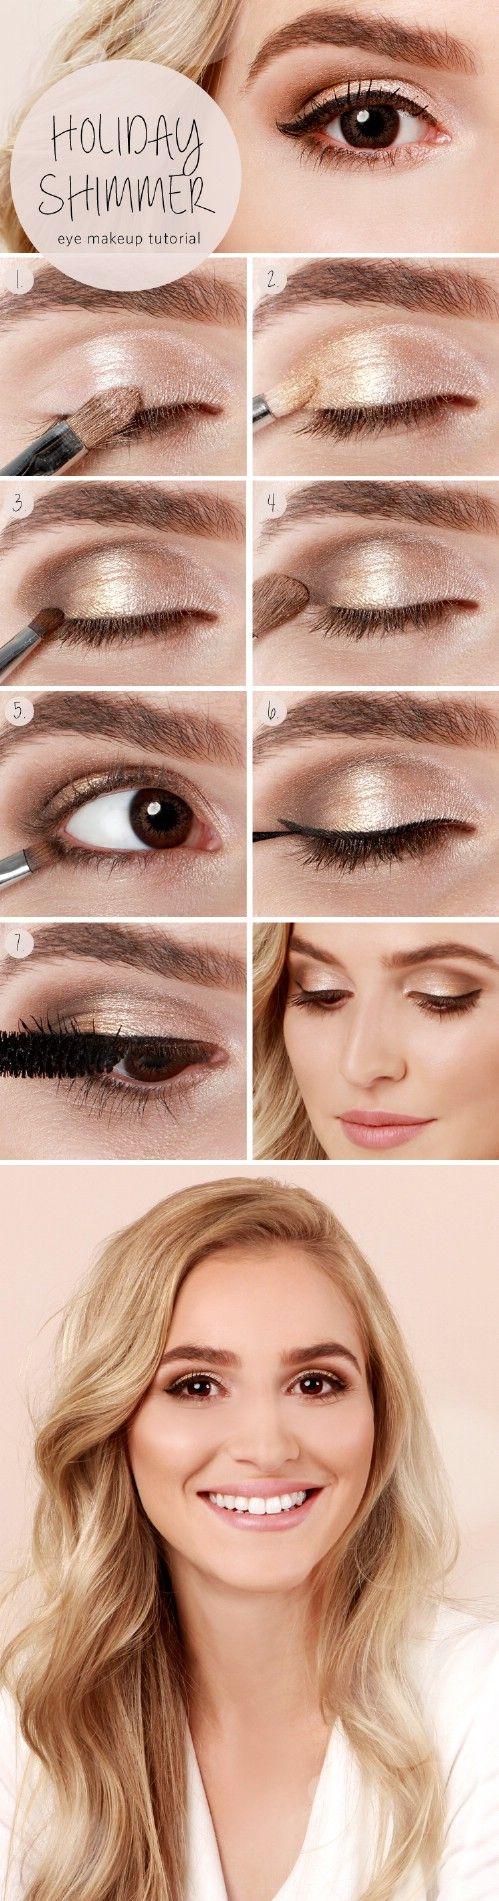 be more beautiful when you use 3D lashes .. CLICK THIS PIN :) #loveit #makeup #eyeshadow #lipstick #lipgloss #moda #beauty #makeupartist #mascara #tagsta